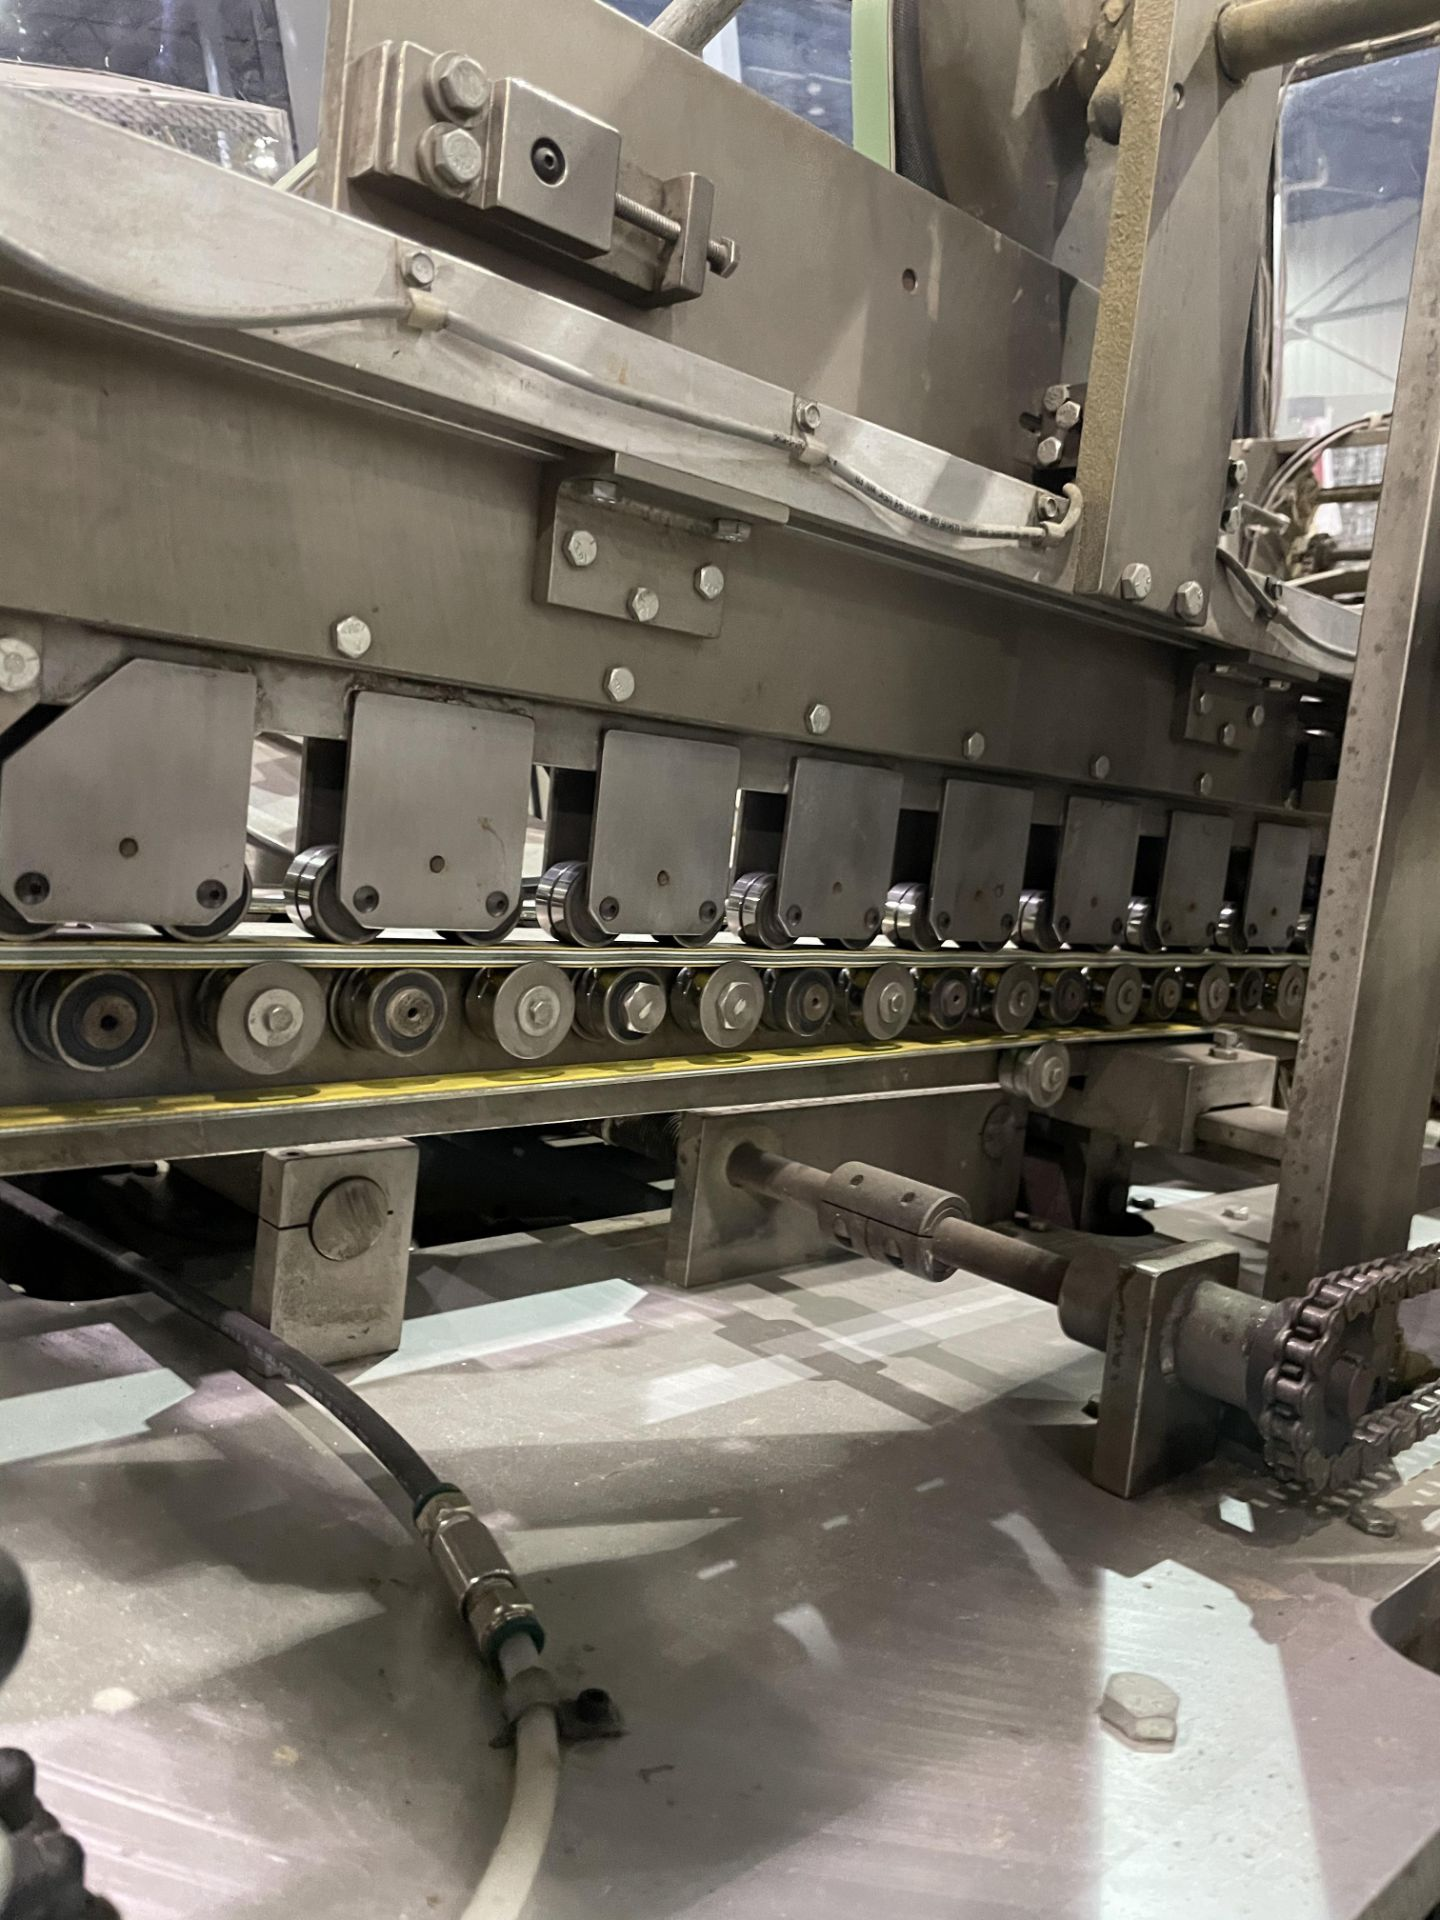 Jones Centurion Side Seam Gluer Model S-5810 Loading/Rigging Fee $650 - Image 6 of 9